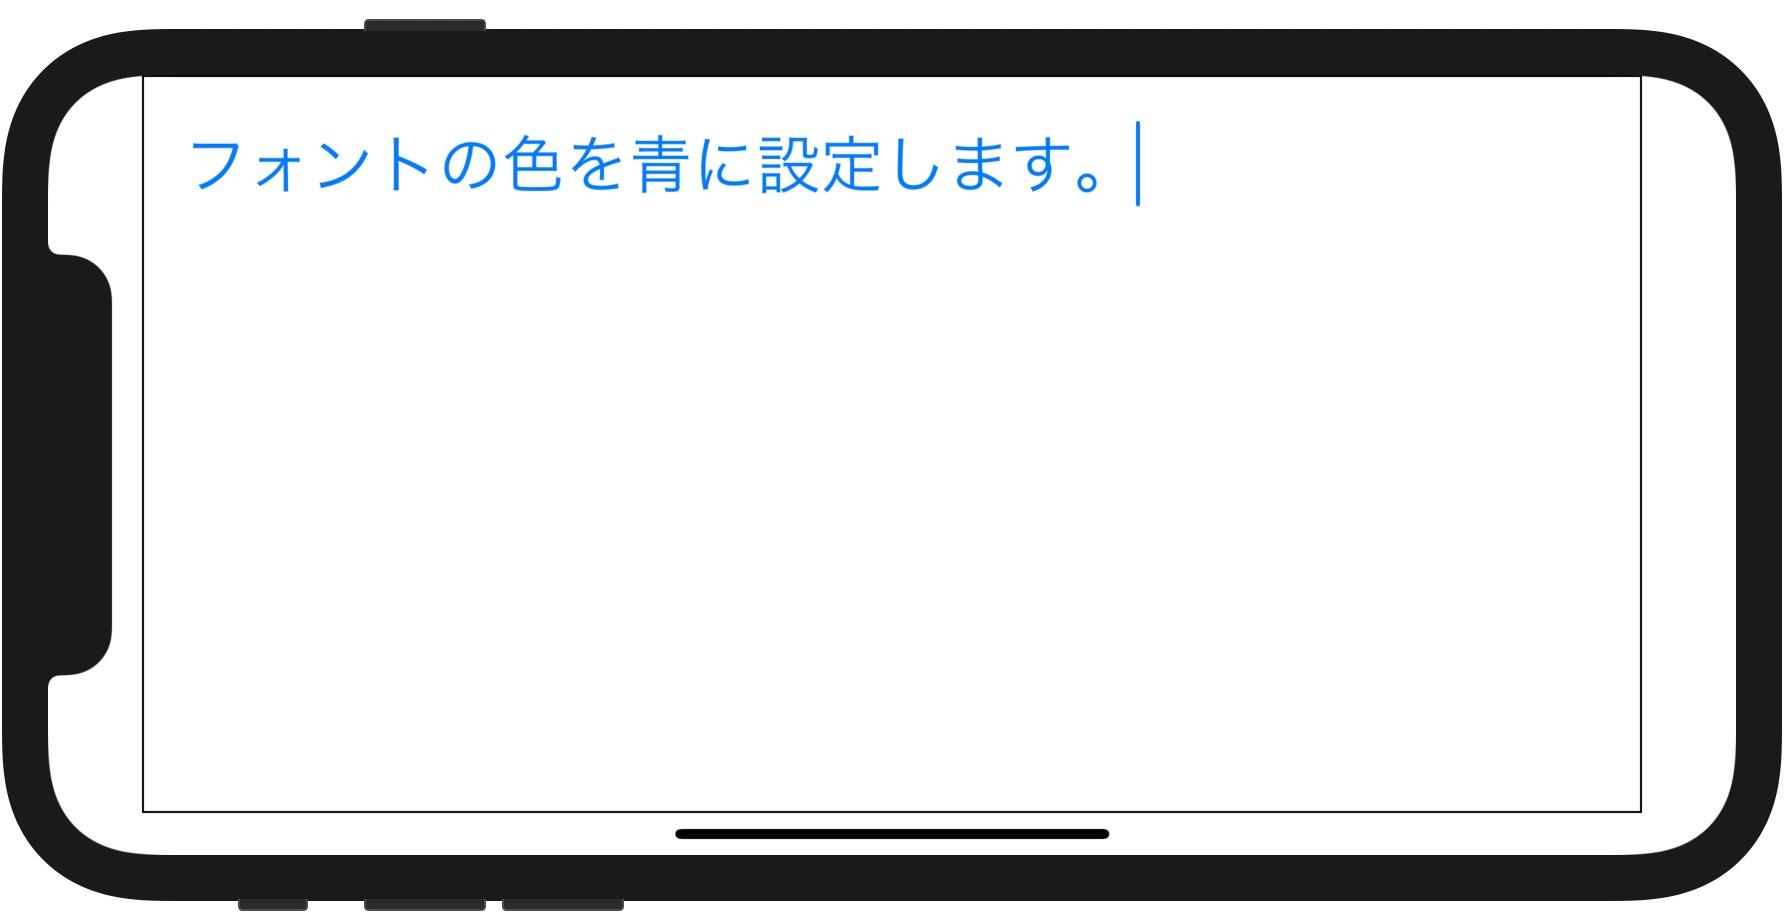 TextEditor でフォントの色を変更する例